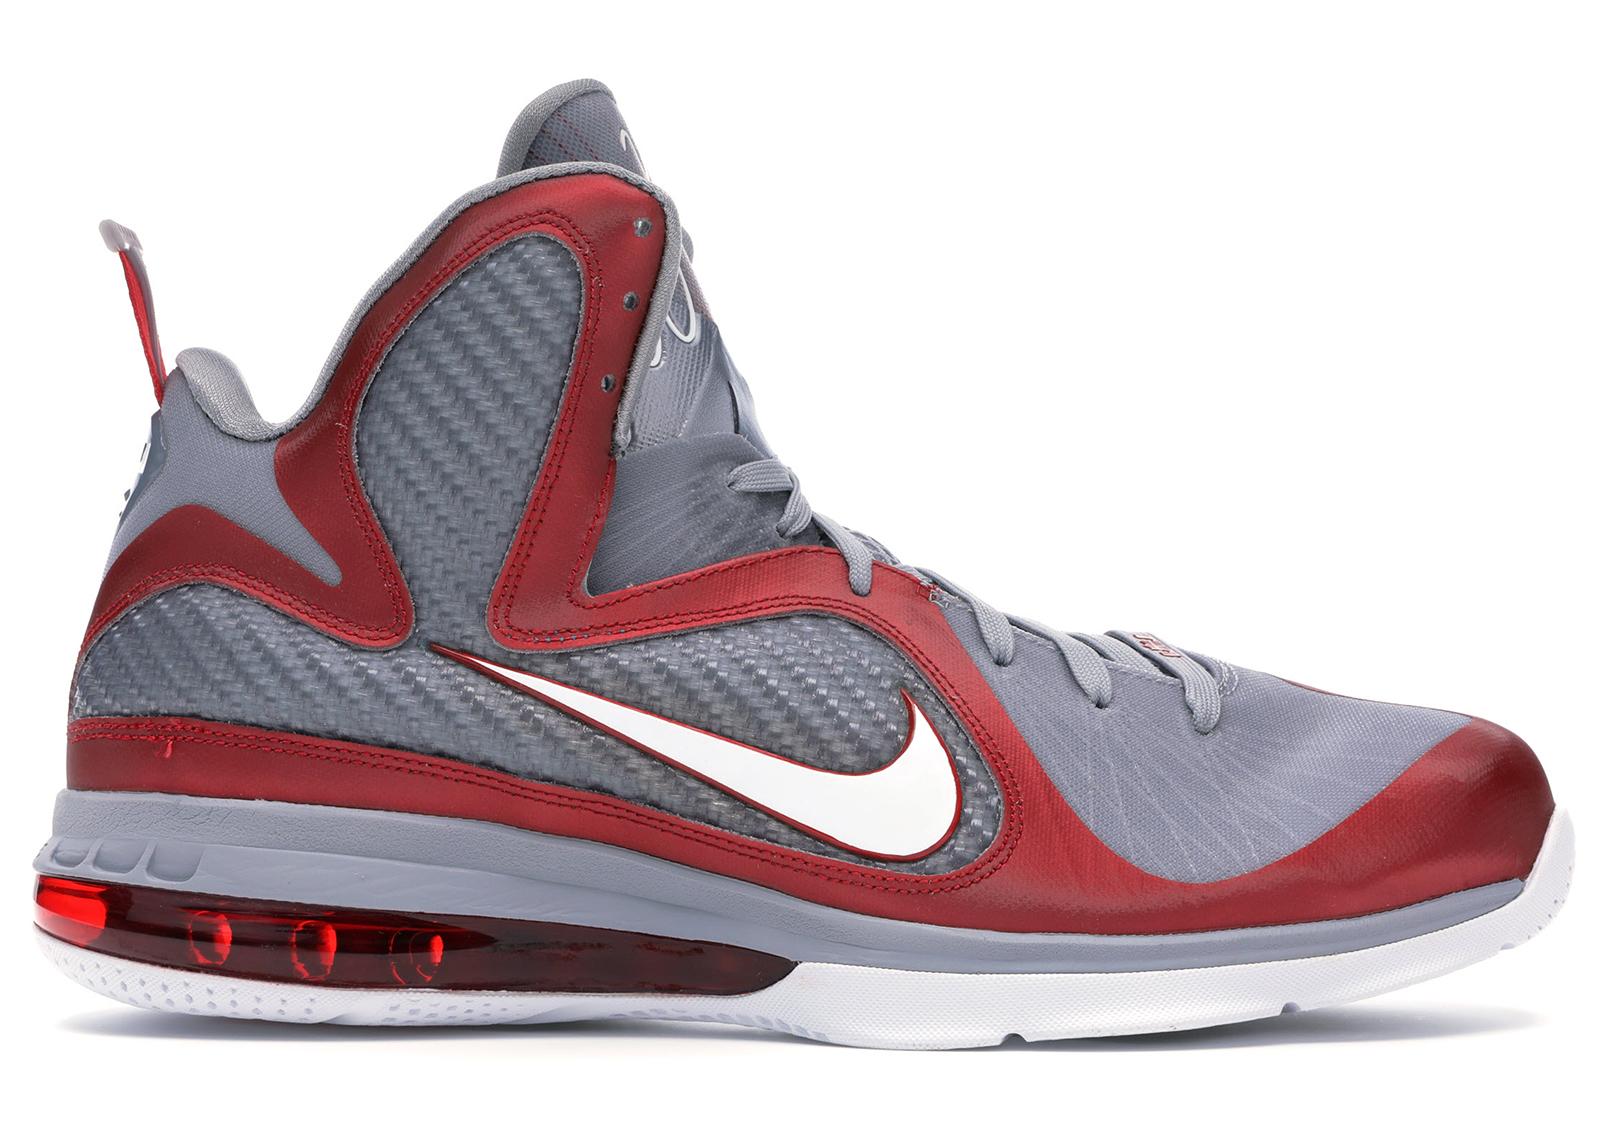 Nike LeBron 9 Ohio State - 469764-601